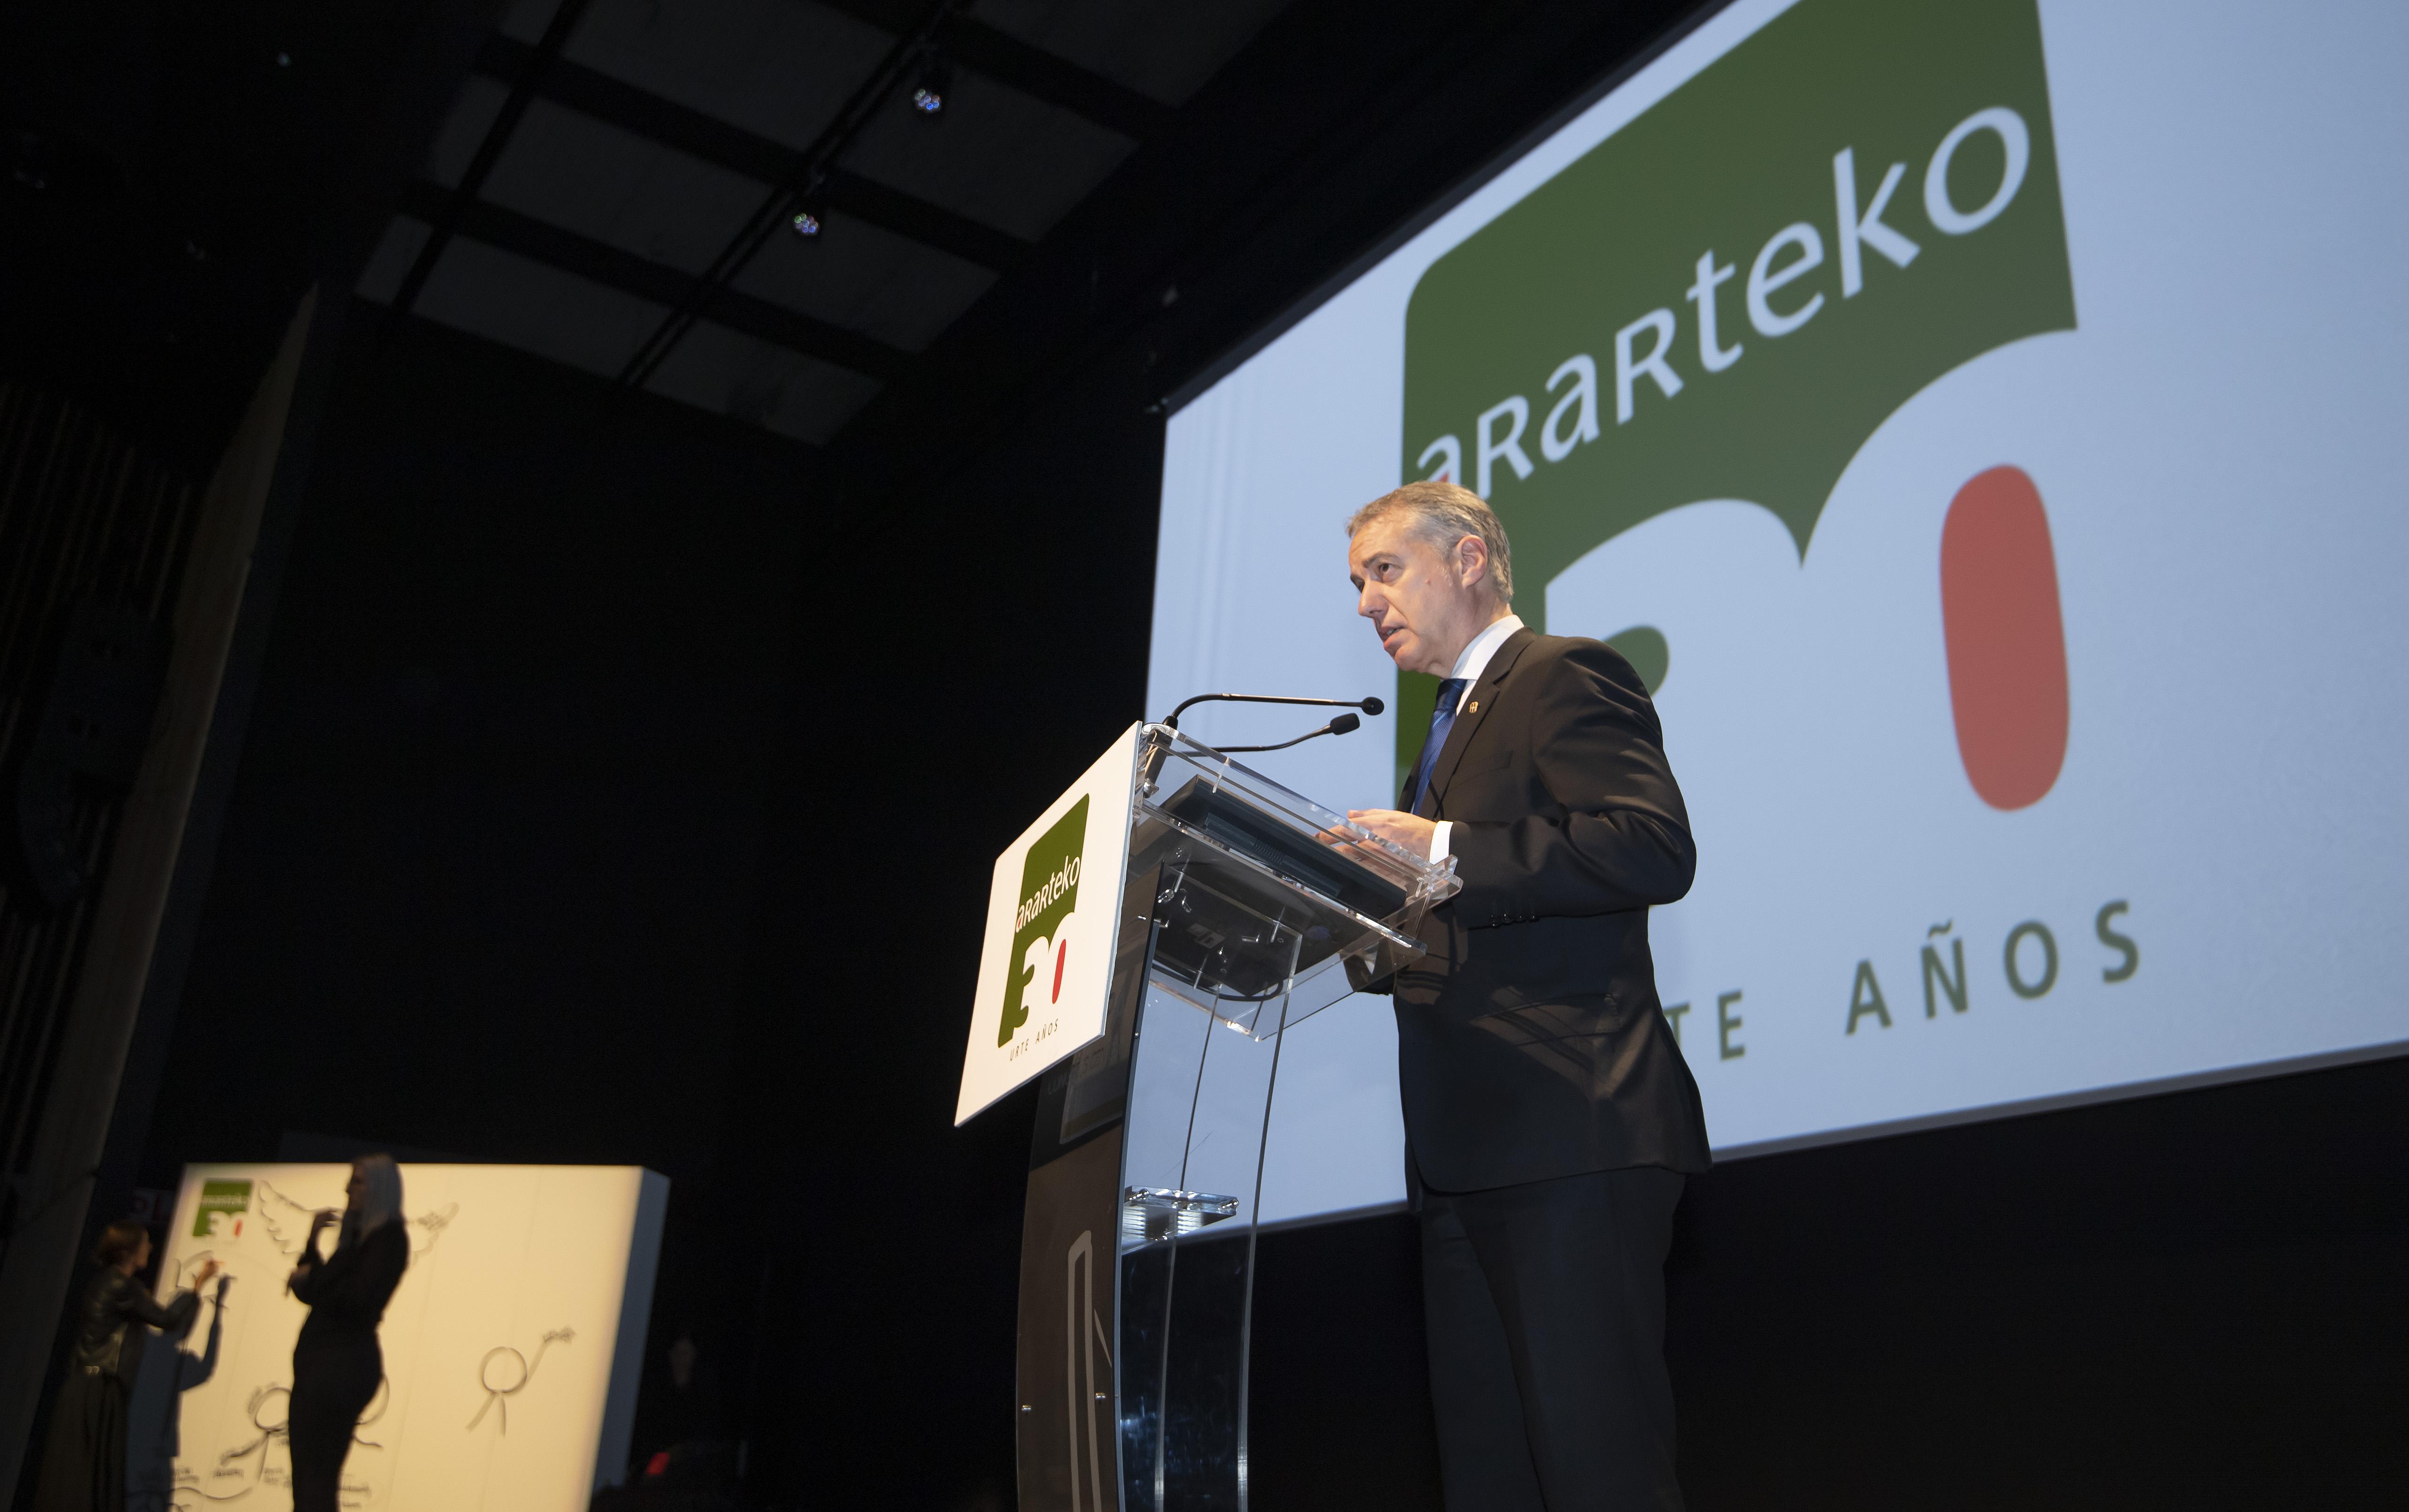 El Lehendakari agradece la labor del Ararteko en su 30 aniversario